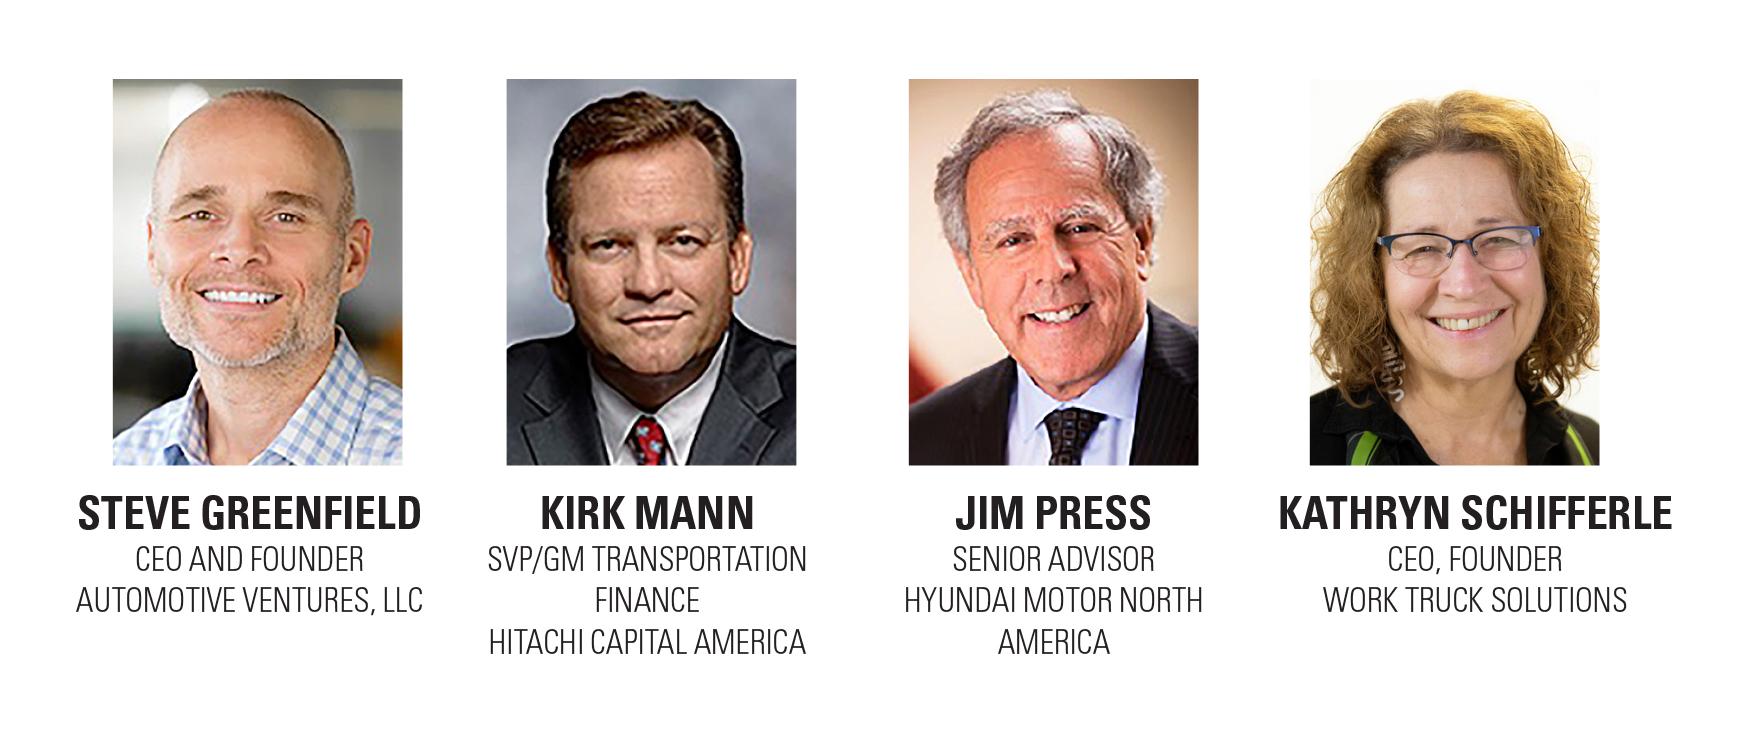 FFC21 Panel to Address Supply Chain Crisis